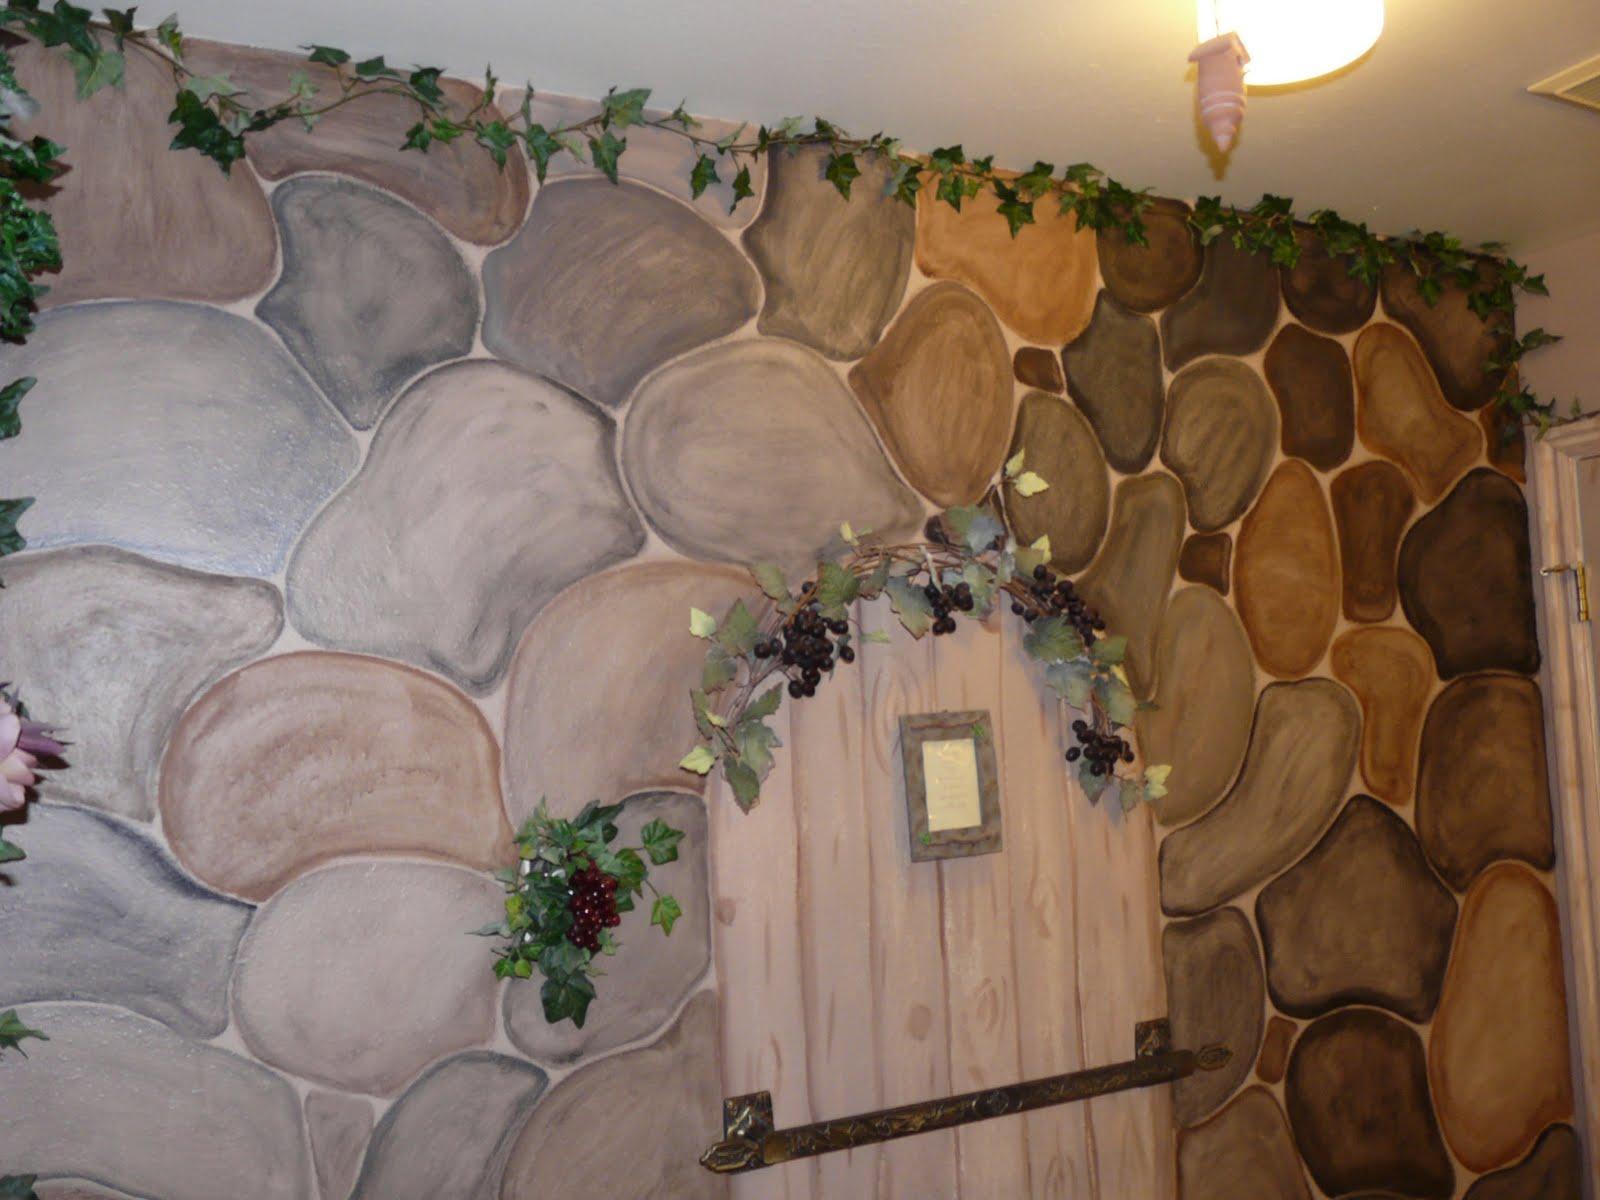 How To Paint Rock Walls Xa09 Roccommunity